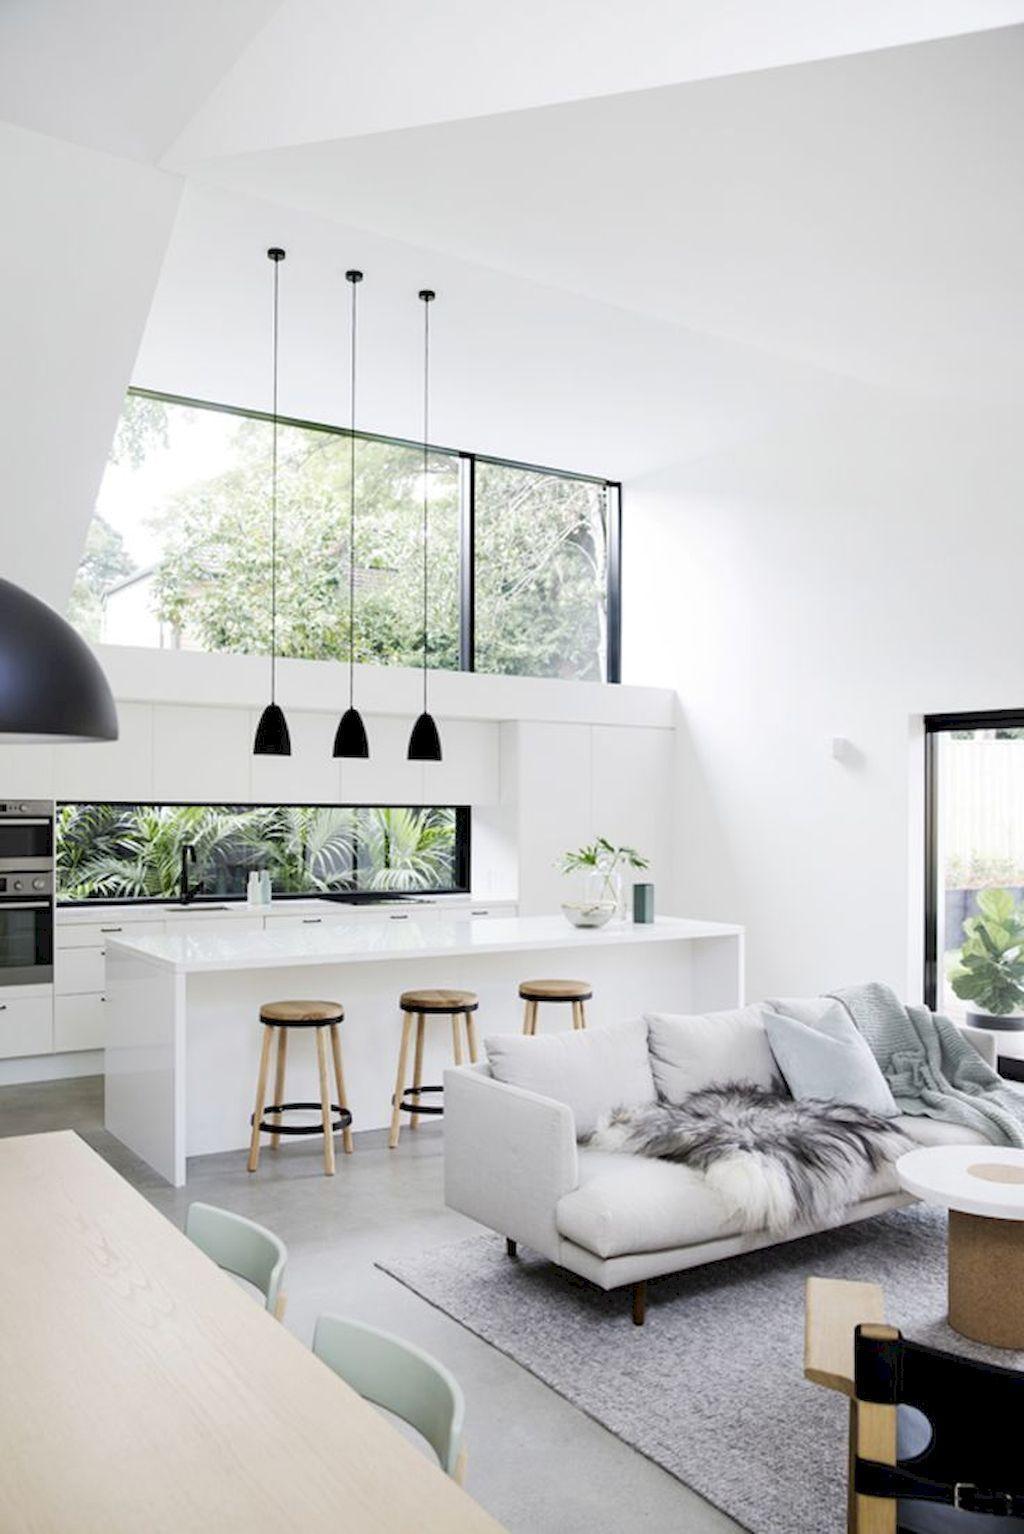 Ideas For Simple Room Decoration Covethouse Architecture Luxuryfurniture Mo19 Maisonobjet Maisonobjetpar House Interior Minimalism Interior House Design Minimalist modern home open dining room